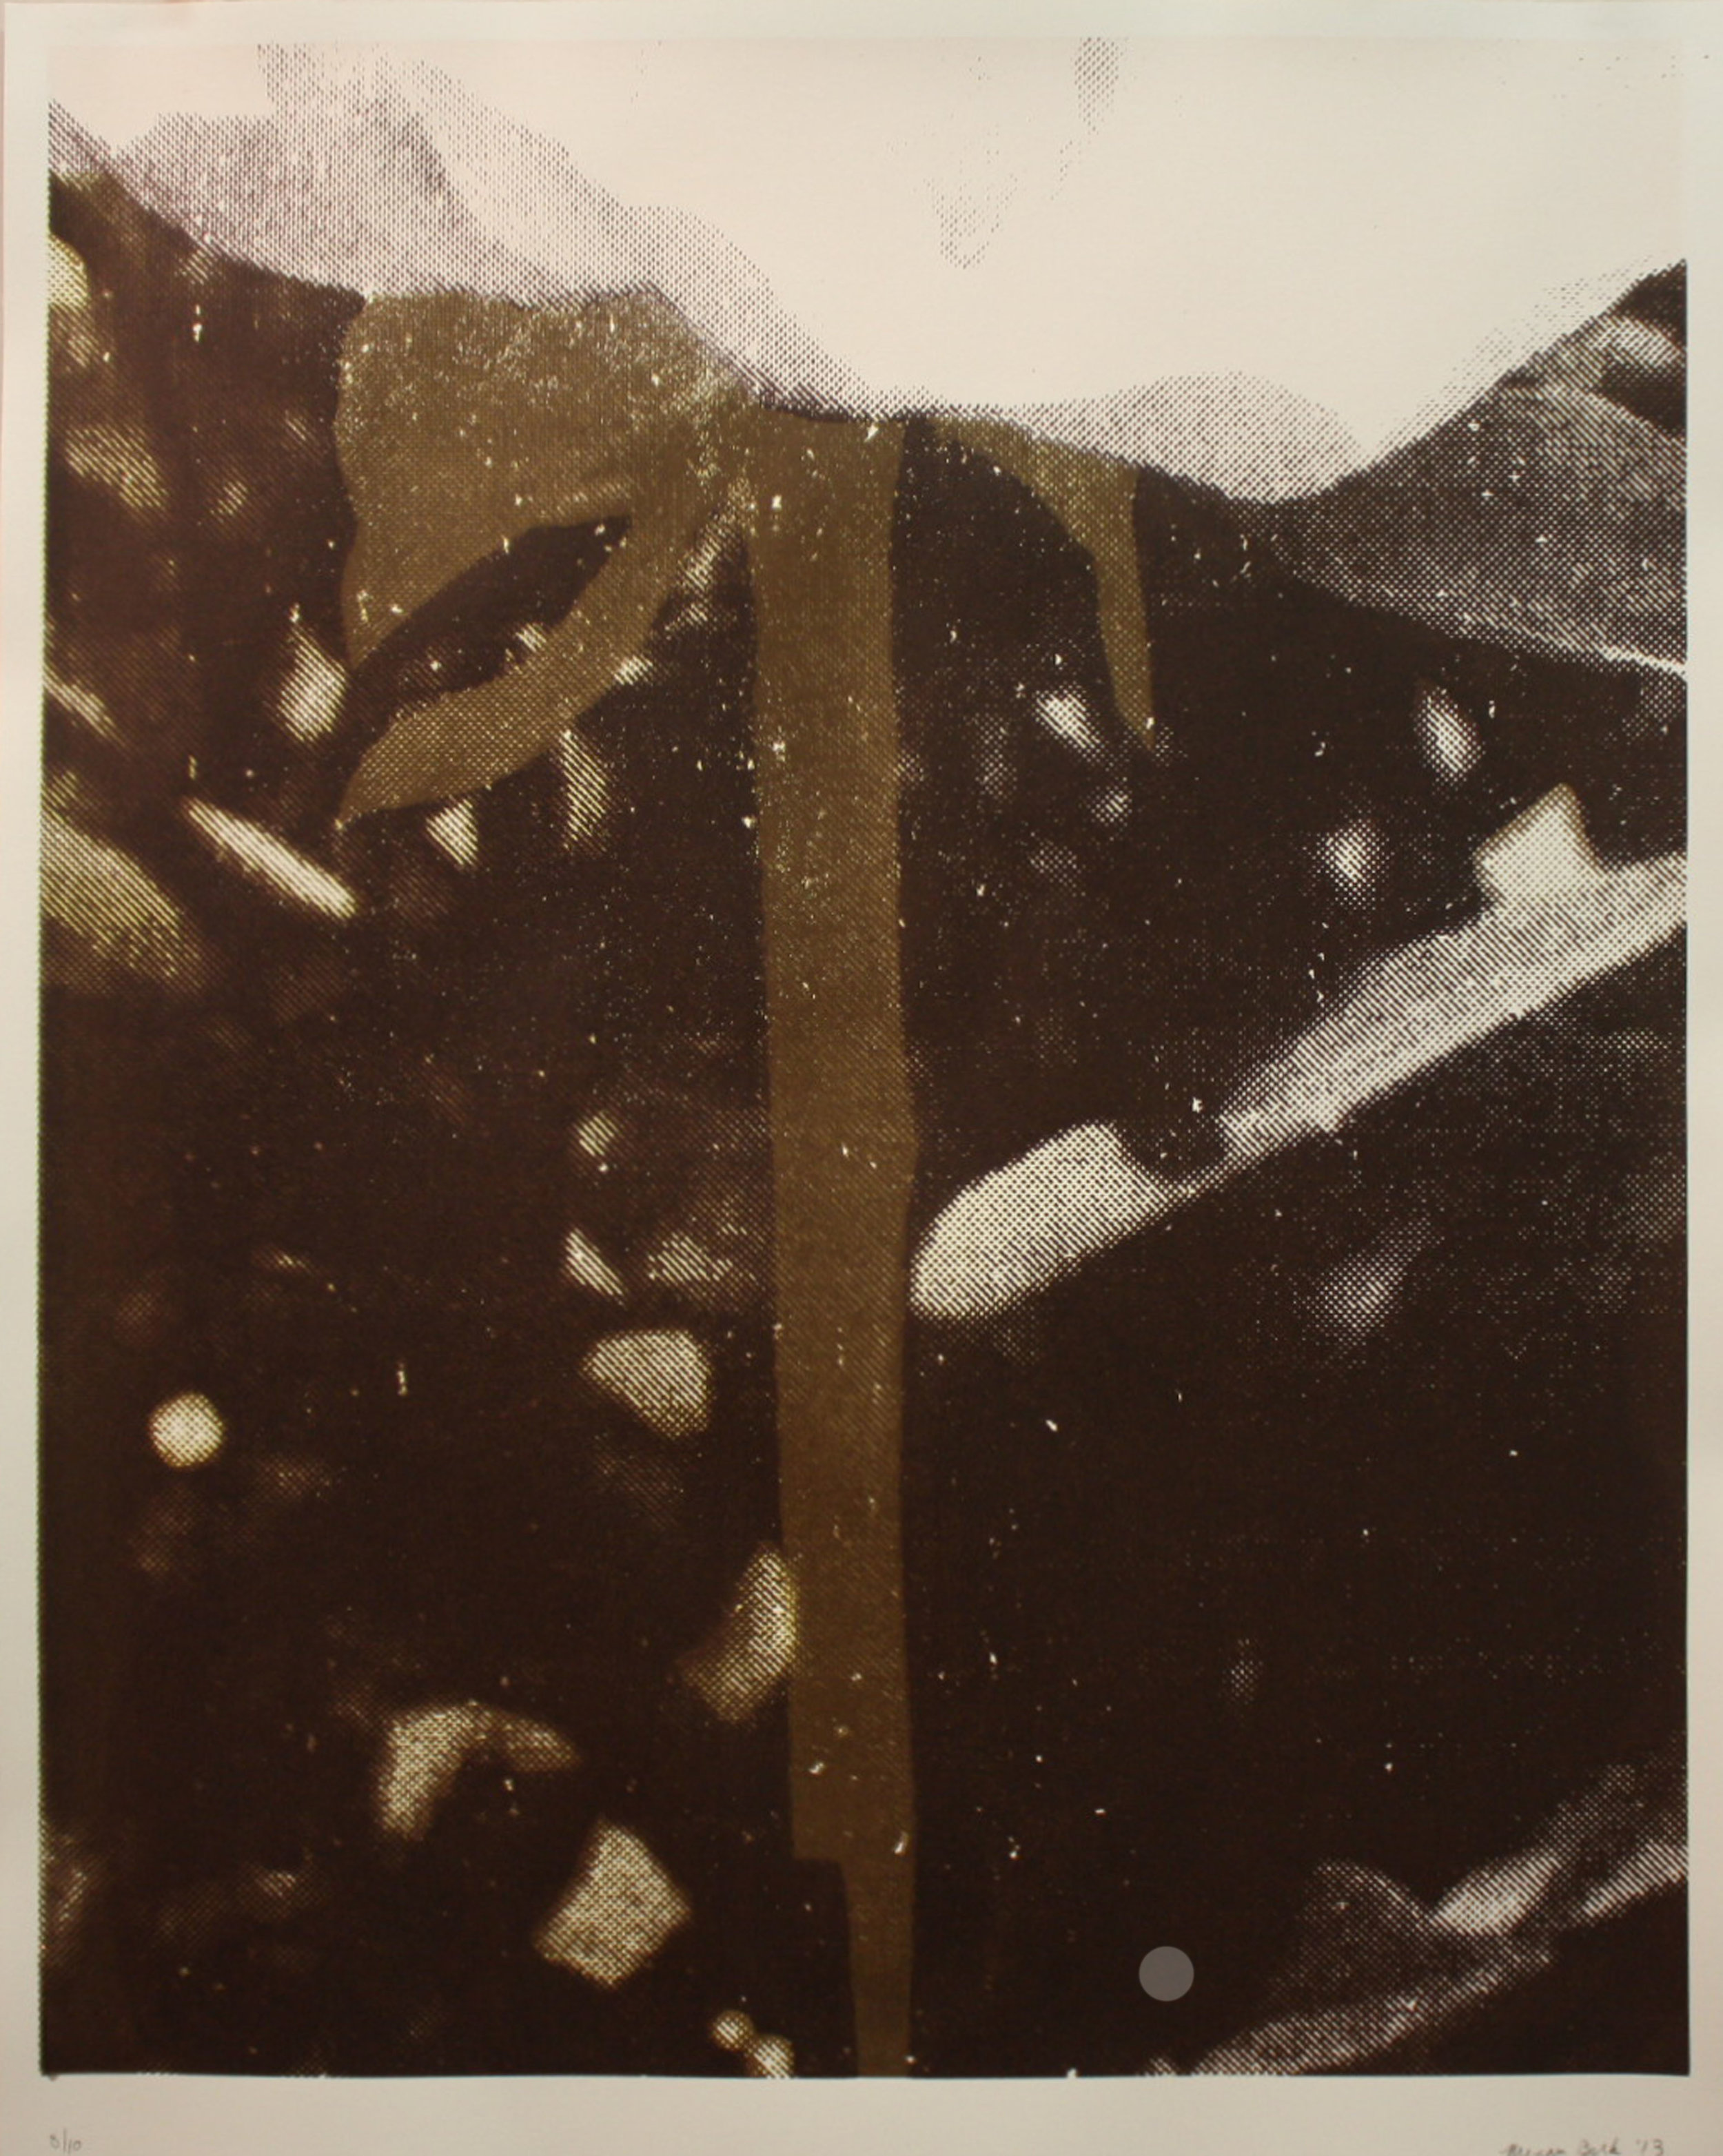 Rose Garden #1, silkscreen, 2013